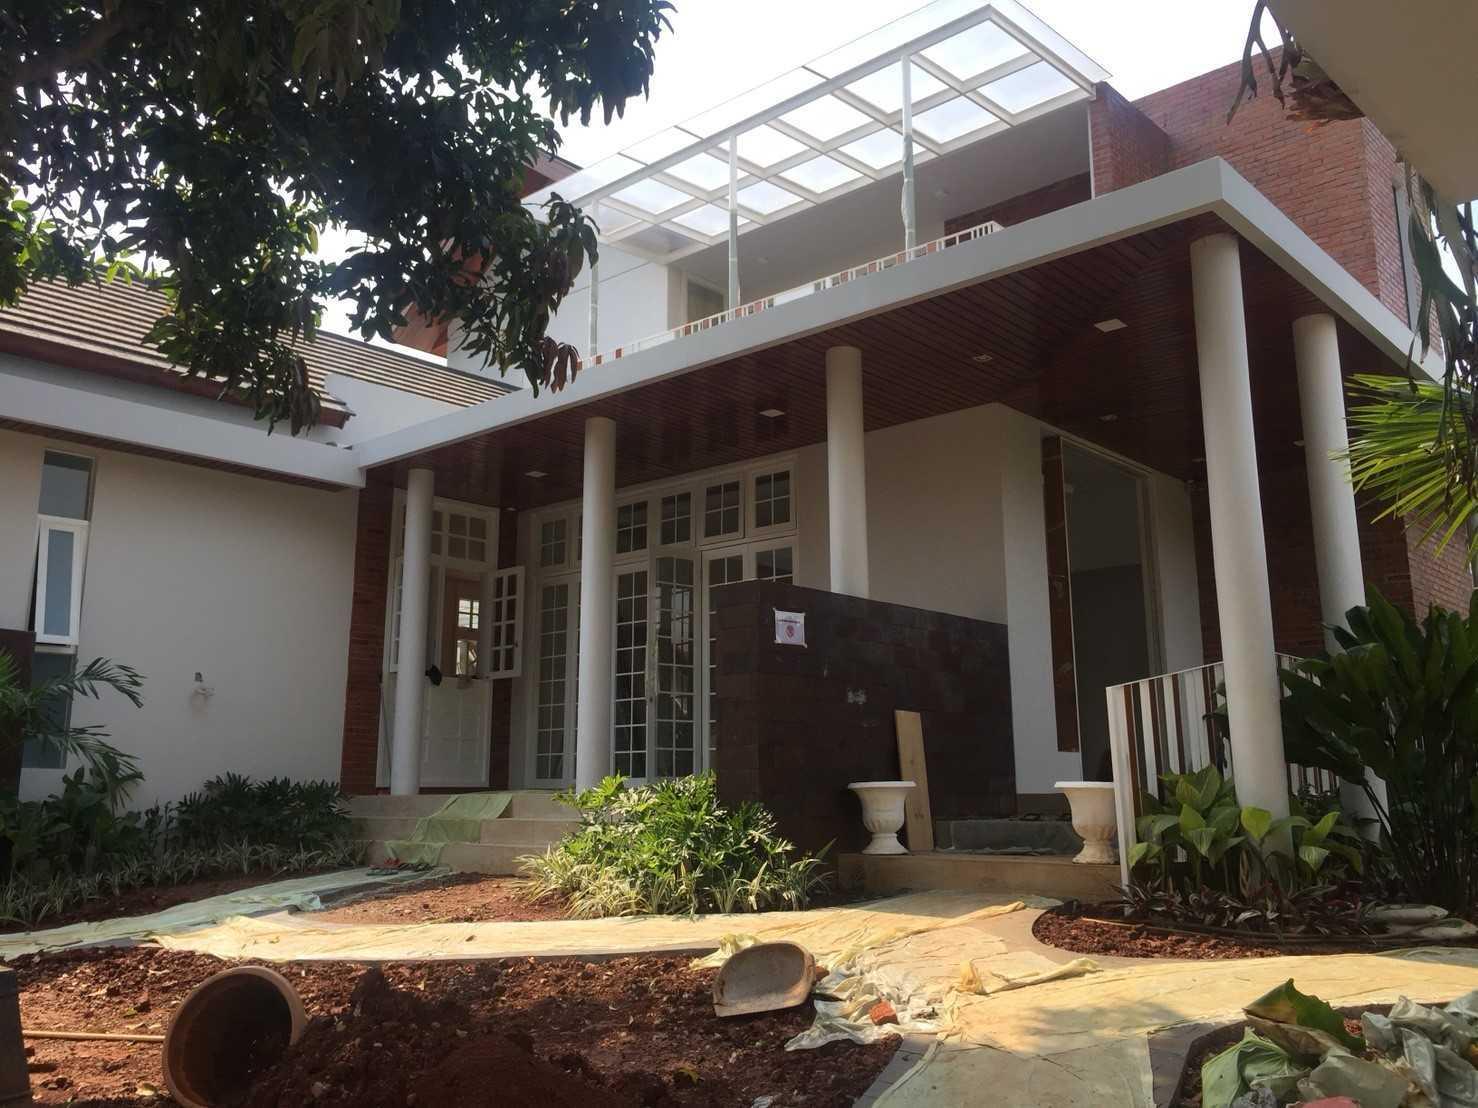 Ho.la Studio Arsitektur K House Bekasi Bar., Kota Bks, Jawa Barat, Indonesia Bekasi Bar., Kota Bks, Jawa Barat, Indonesia Hola-Studio-Arsitektur-K-House   68920